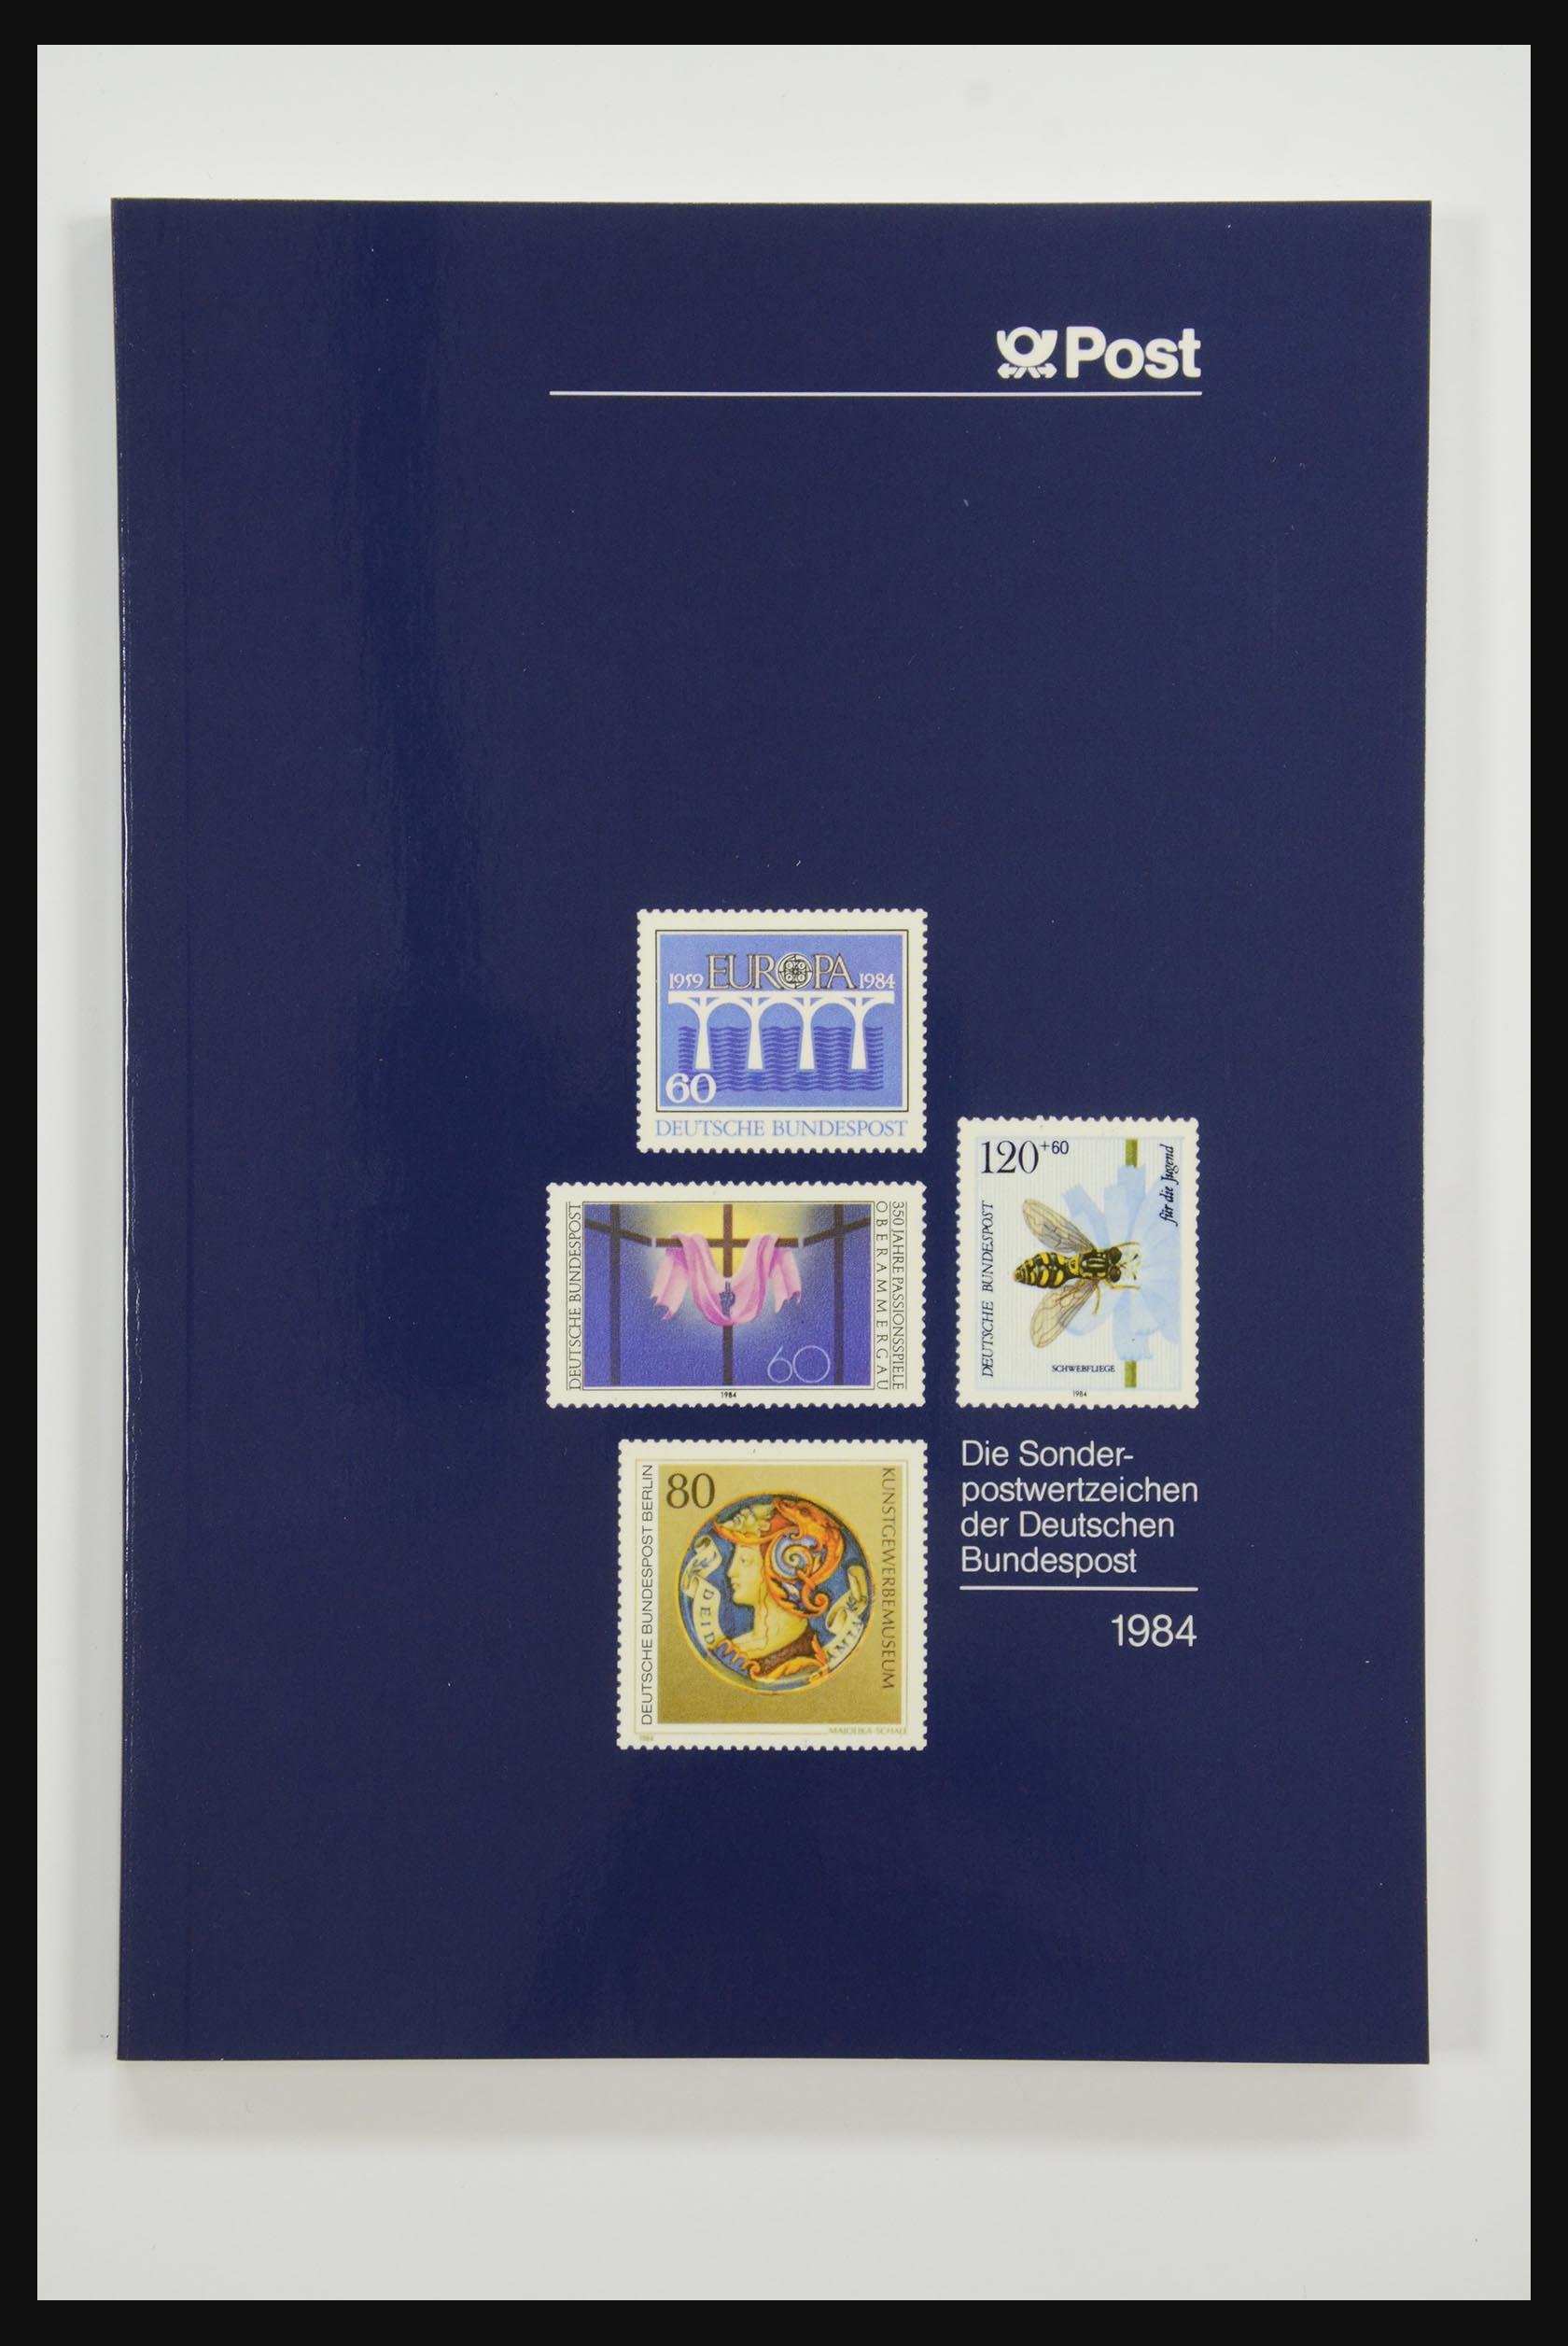 31834 012 - 31834 Bundespost yearbooks 1973(!)-1999.